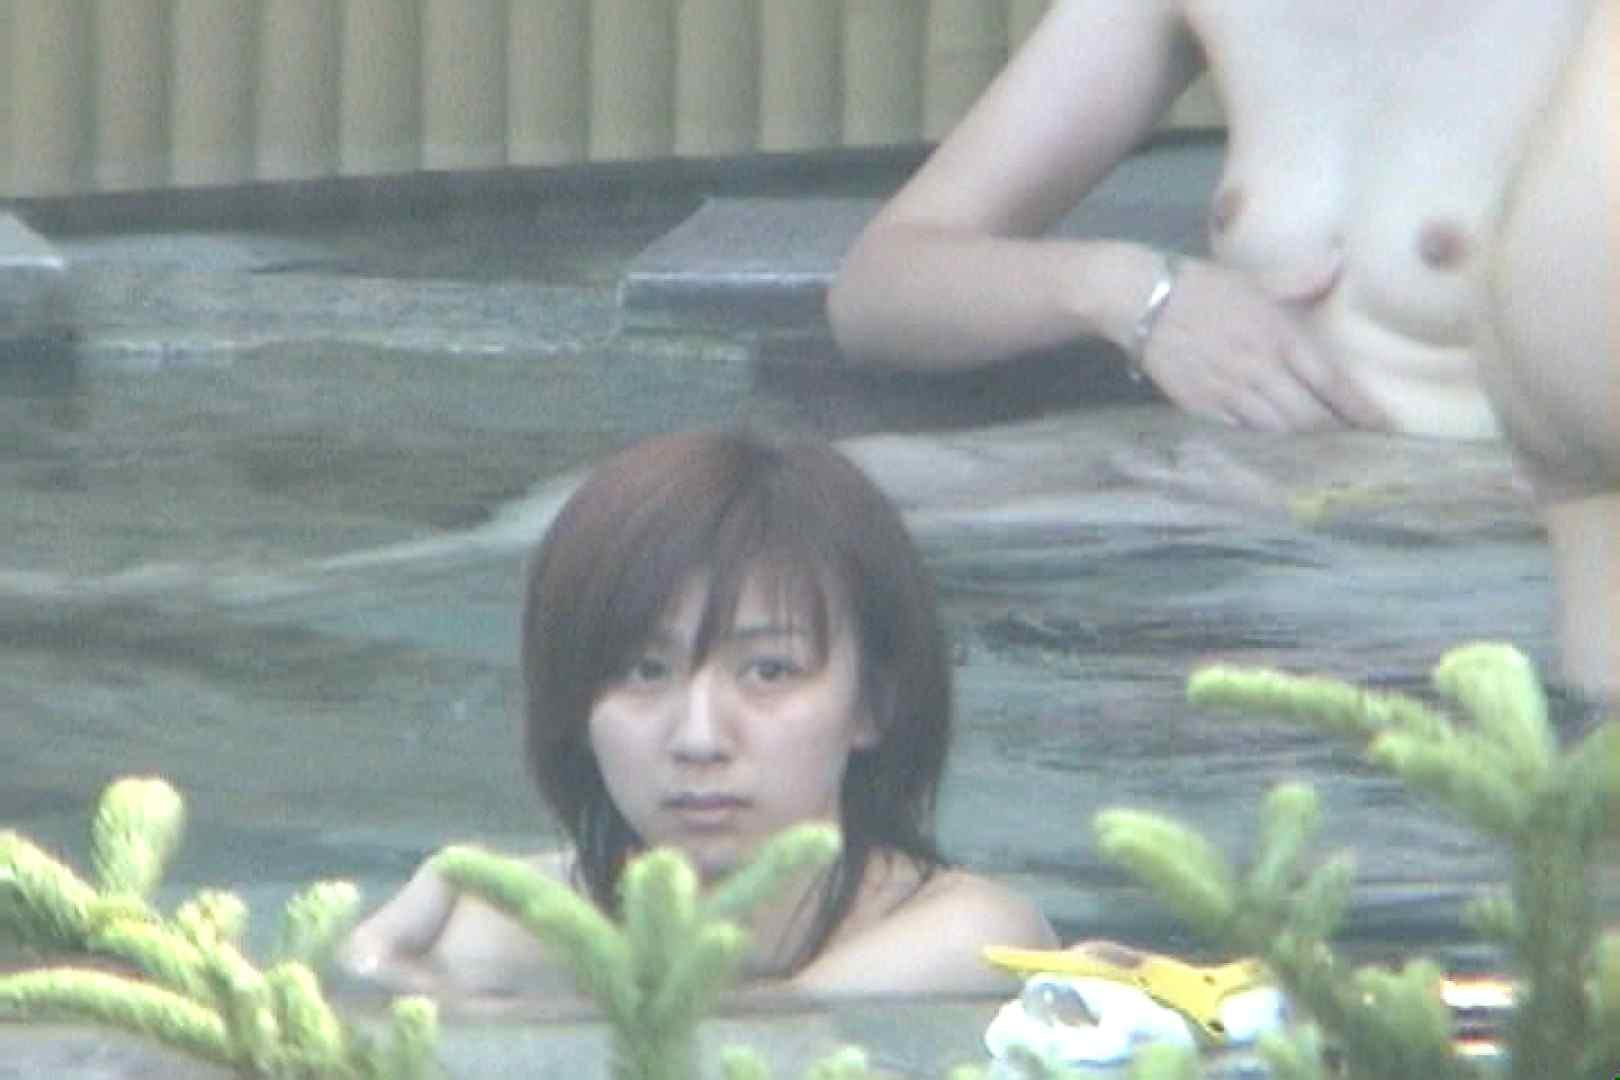 Aquaな露天風呂Vol.77【VIP限定】 露天   盗撮特集  98画像 80